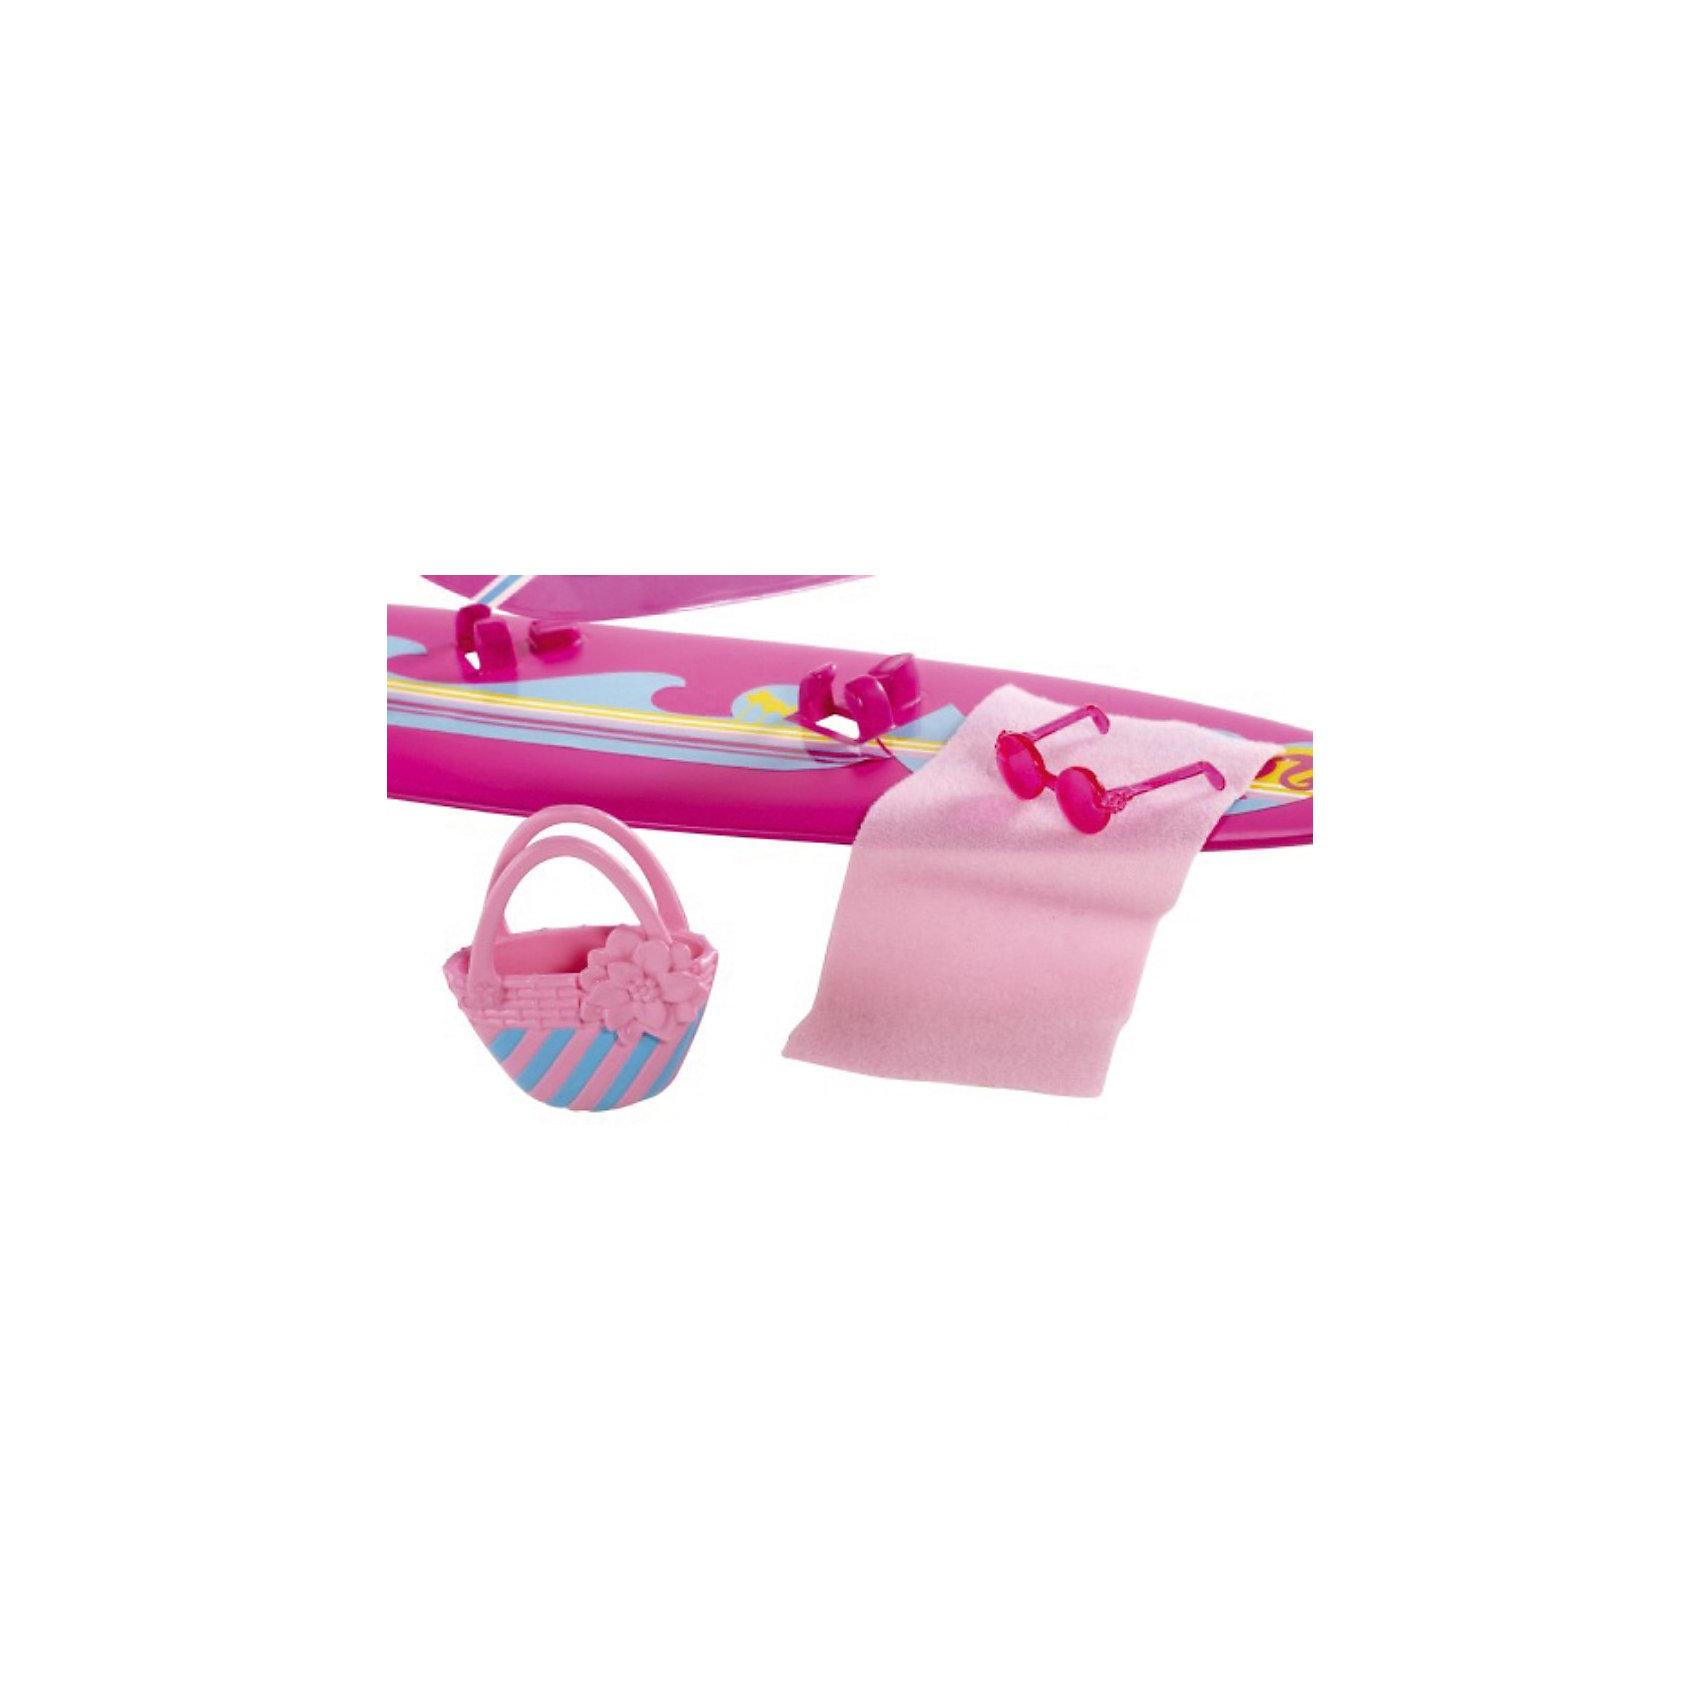 Mattel Аксессуары для прогулки: Виндсерф, Barbie mattel виндсерф barbie